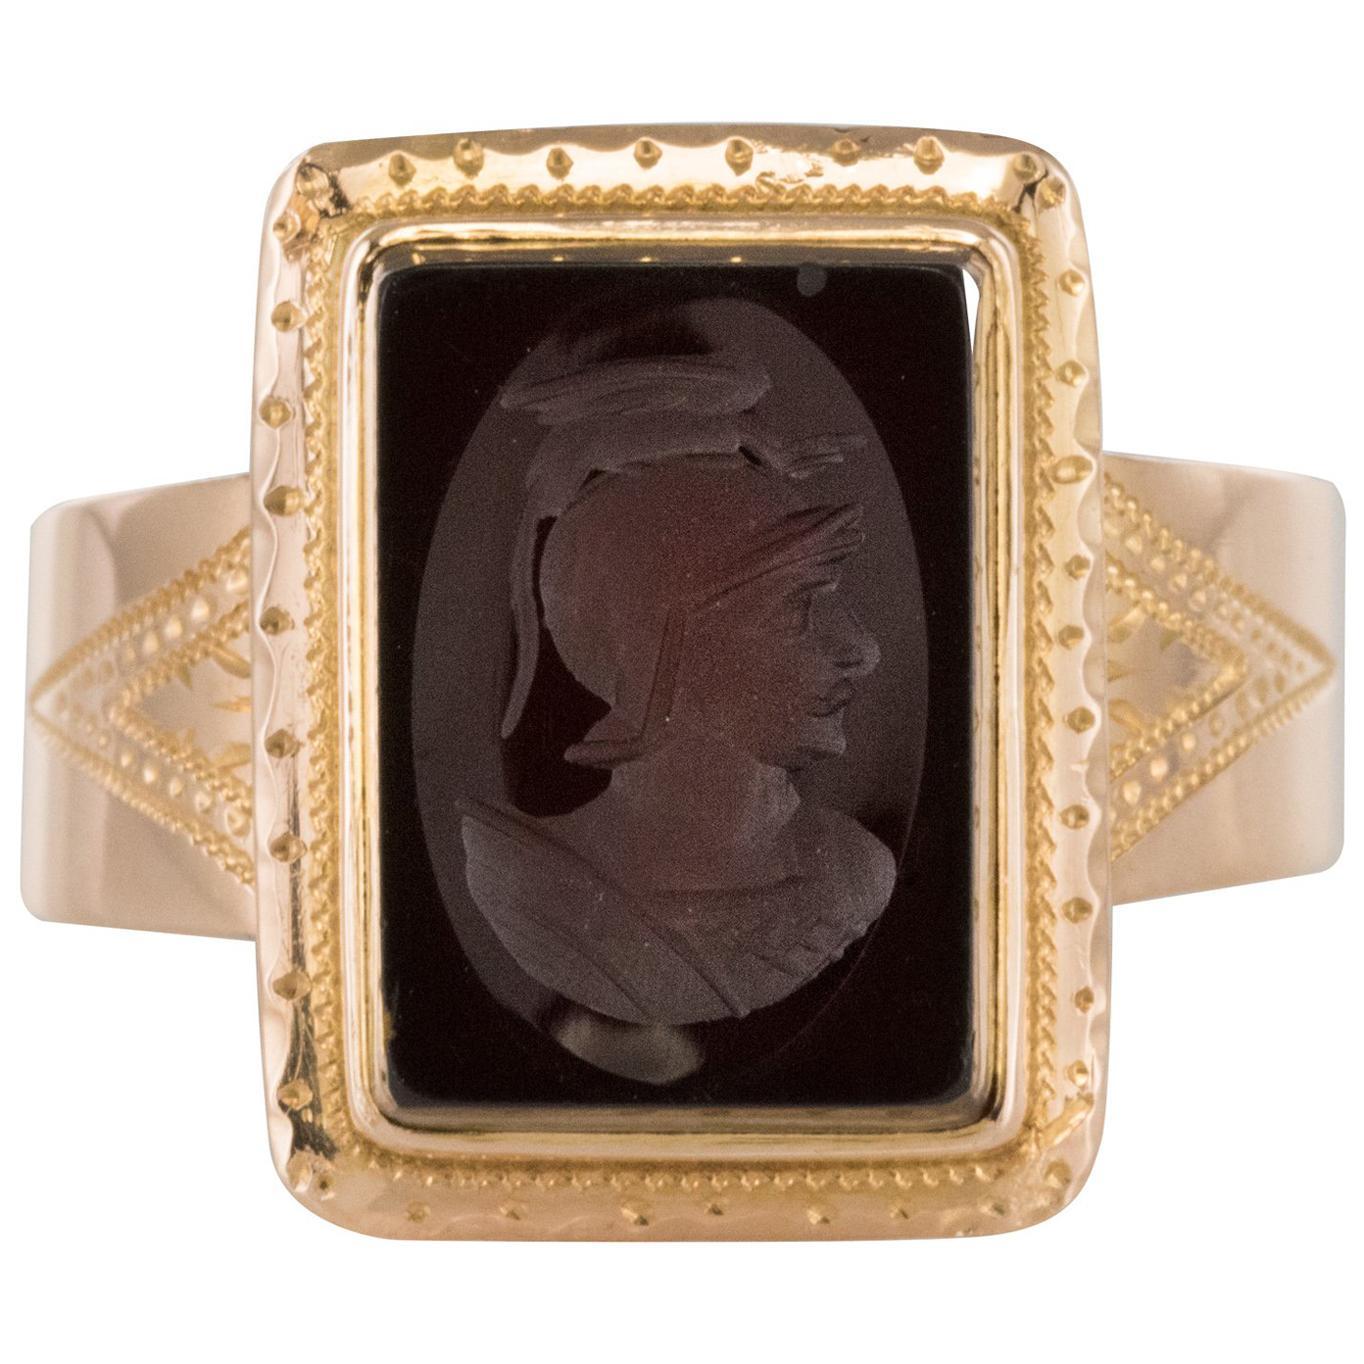 French Napoleon Third 19th Century Carnelian Intaglio Gold Signet Ring